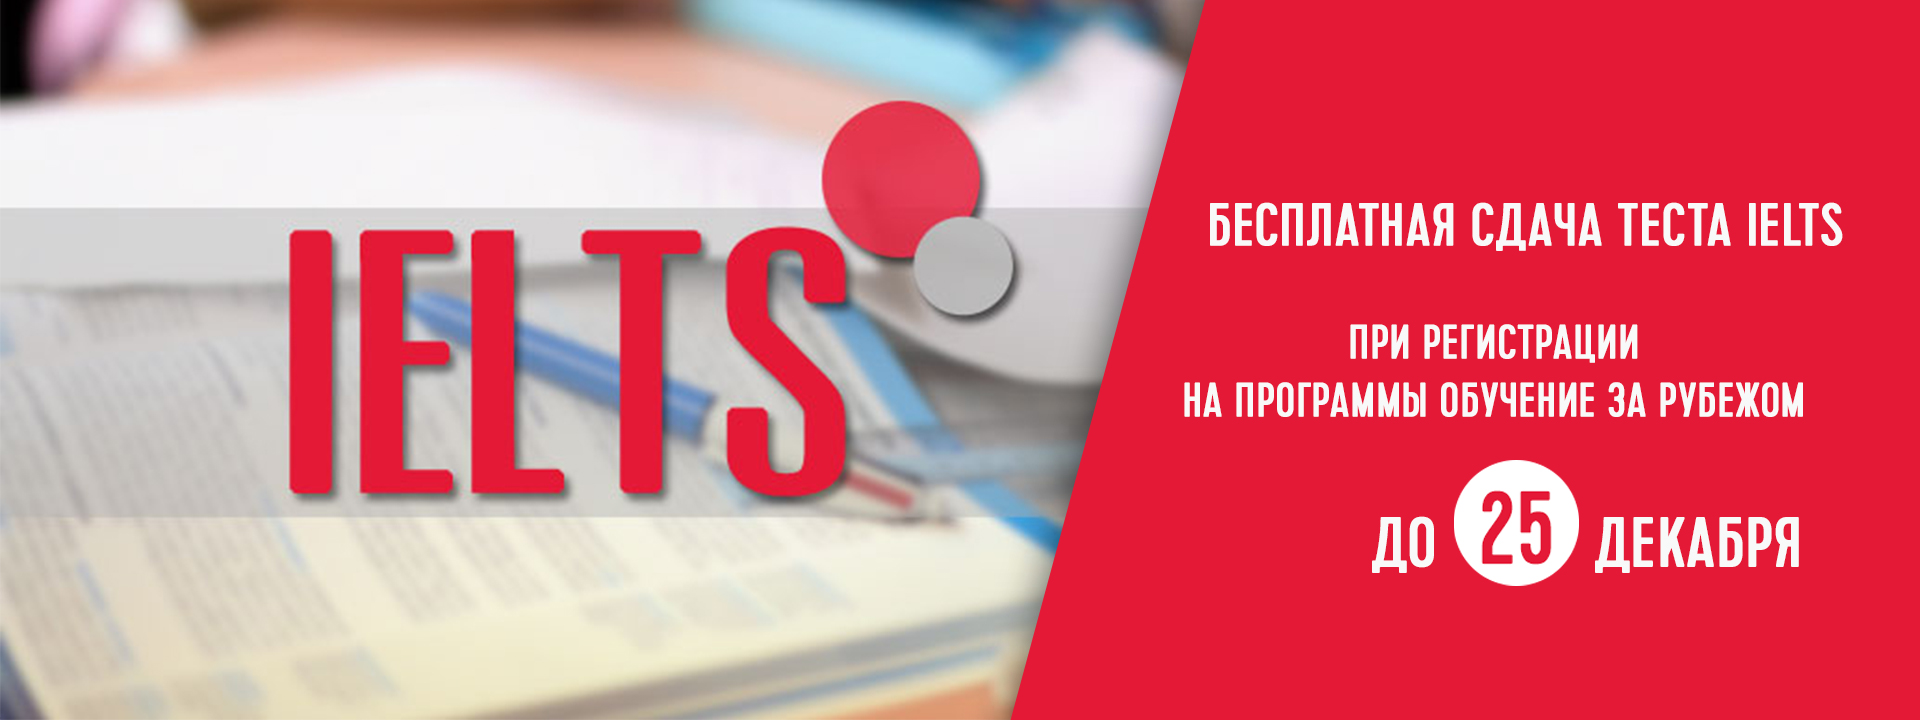 Сертификат на бесплатную сдачу теста IELTS